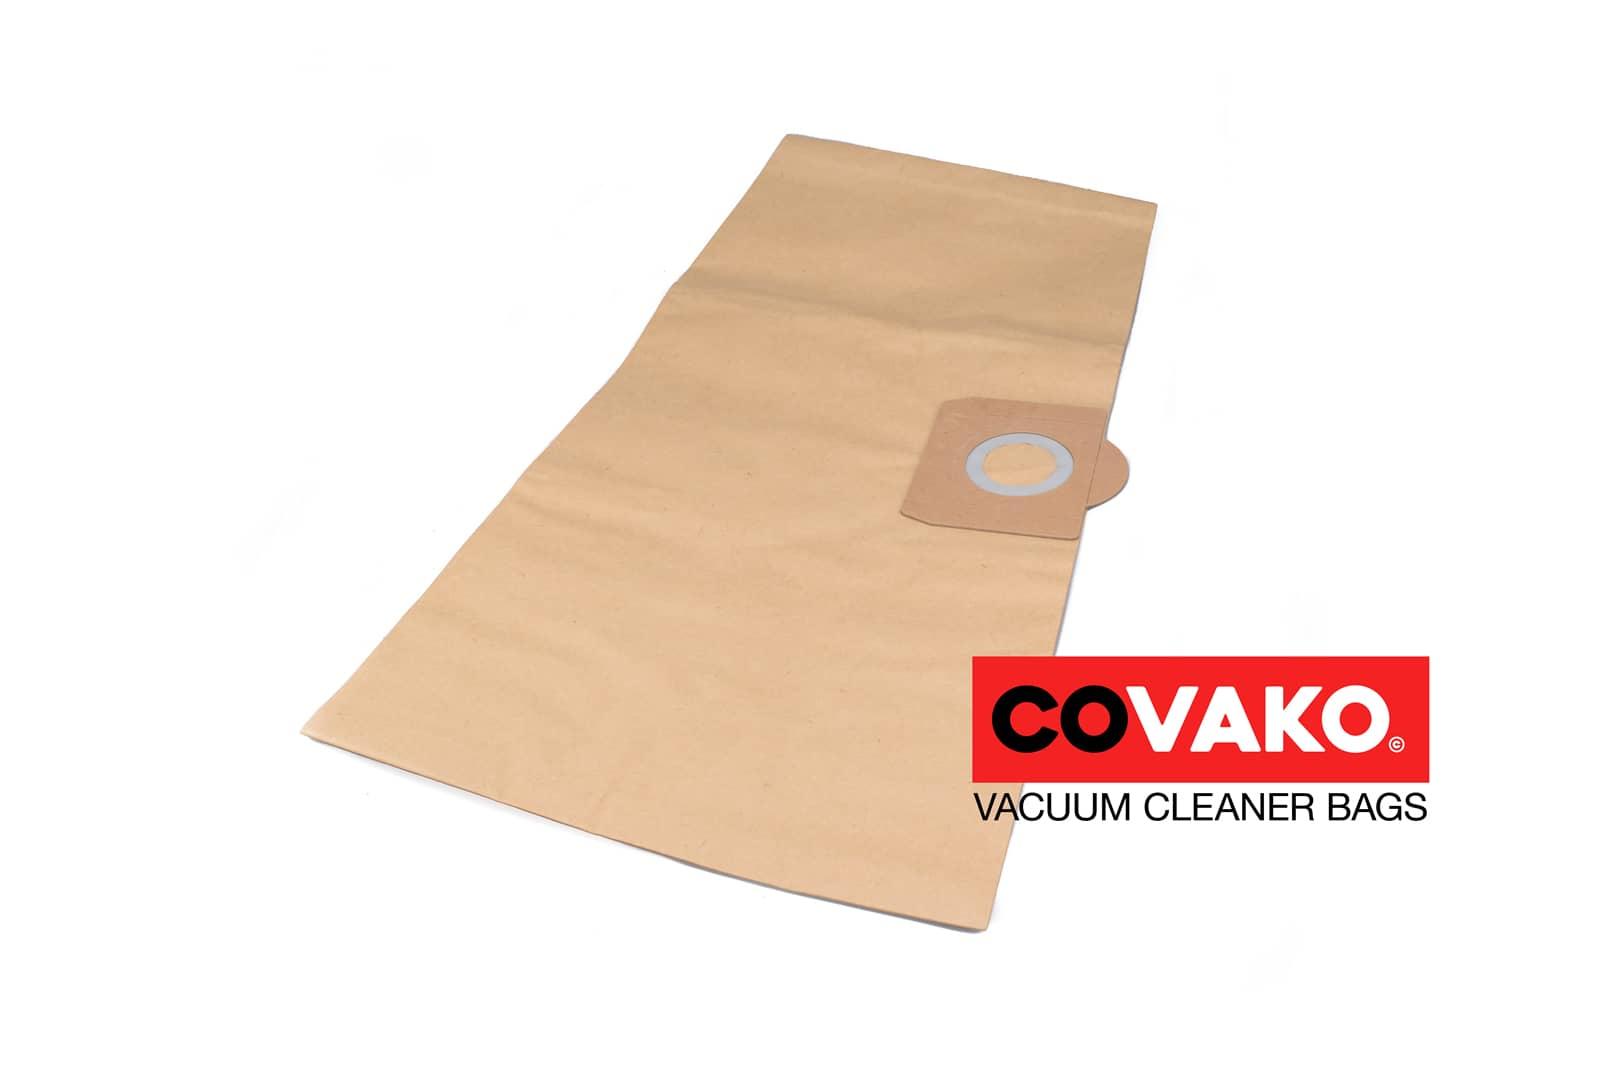 Wirbel 819 / Papier - Wirbel stofzuigerzakken